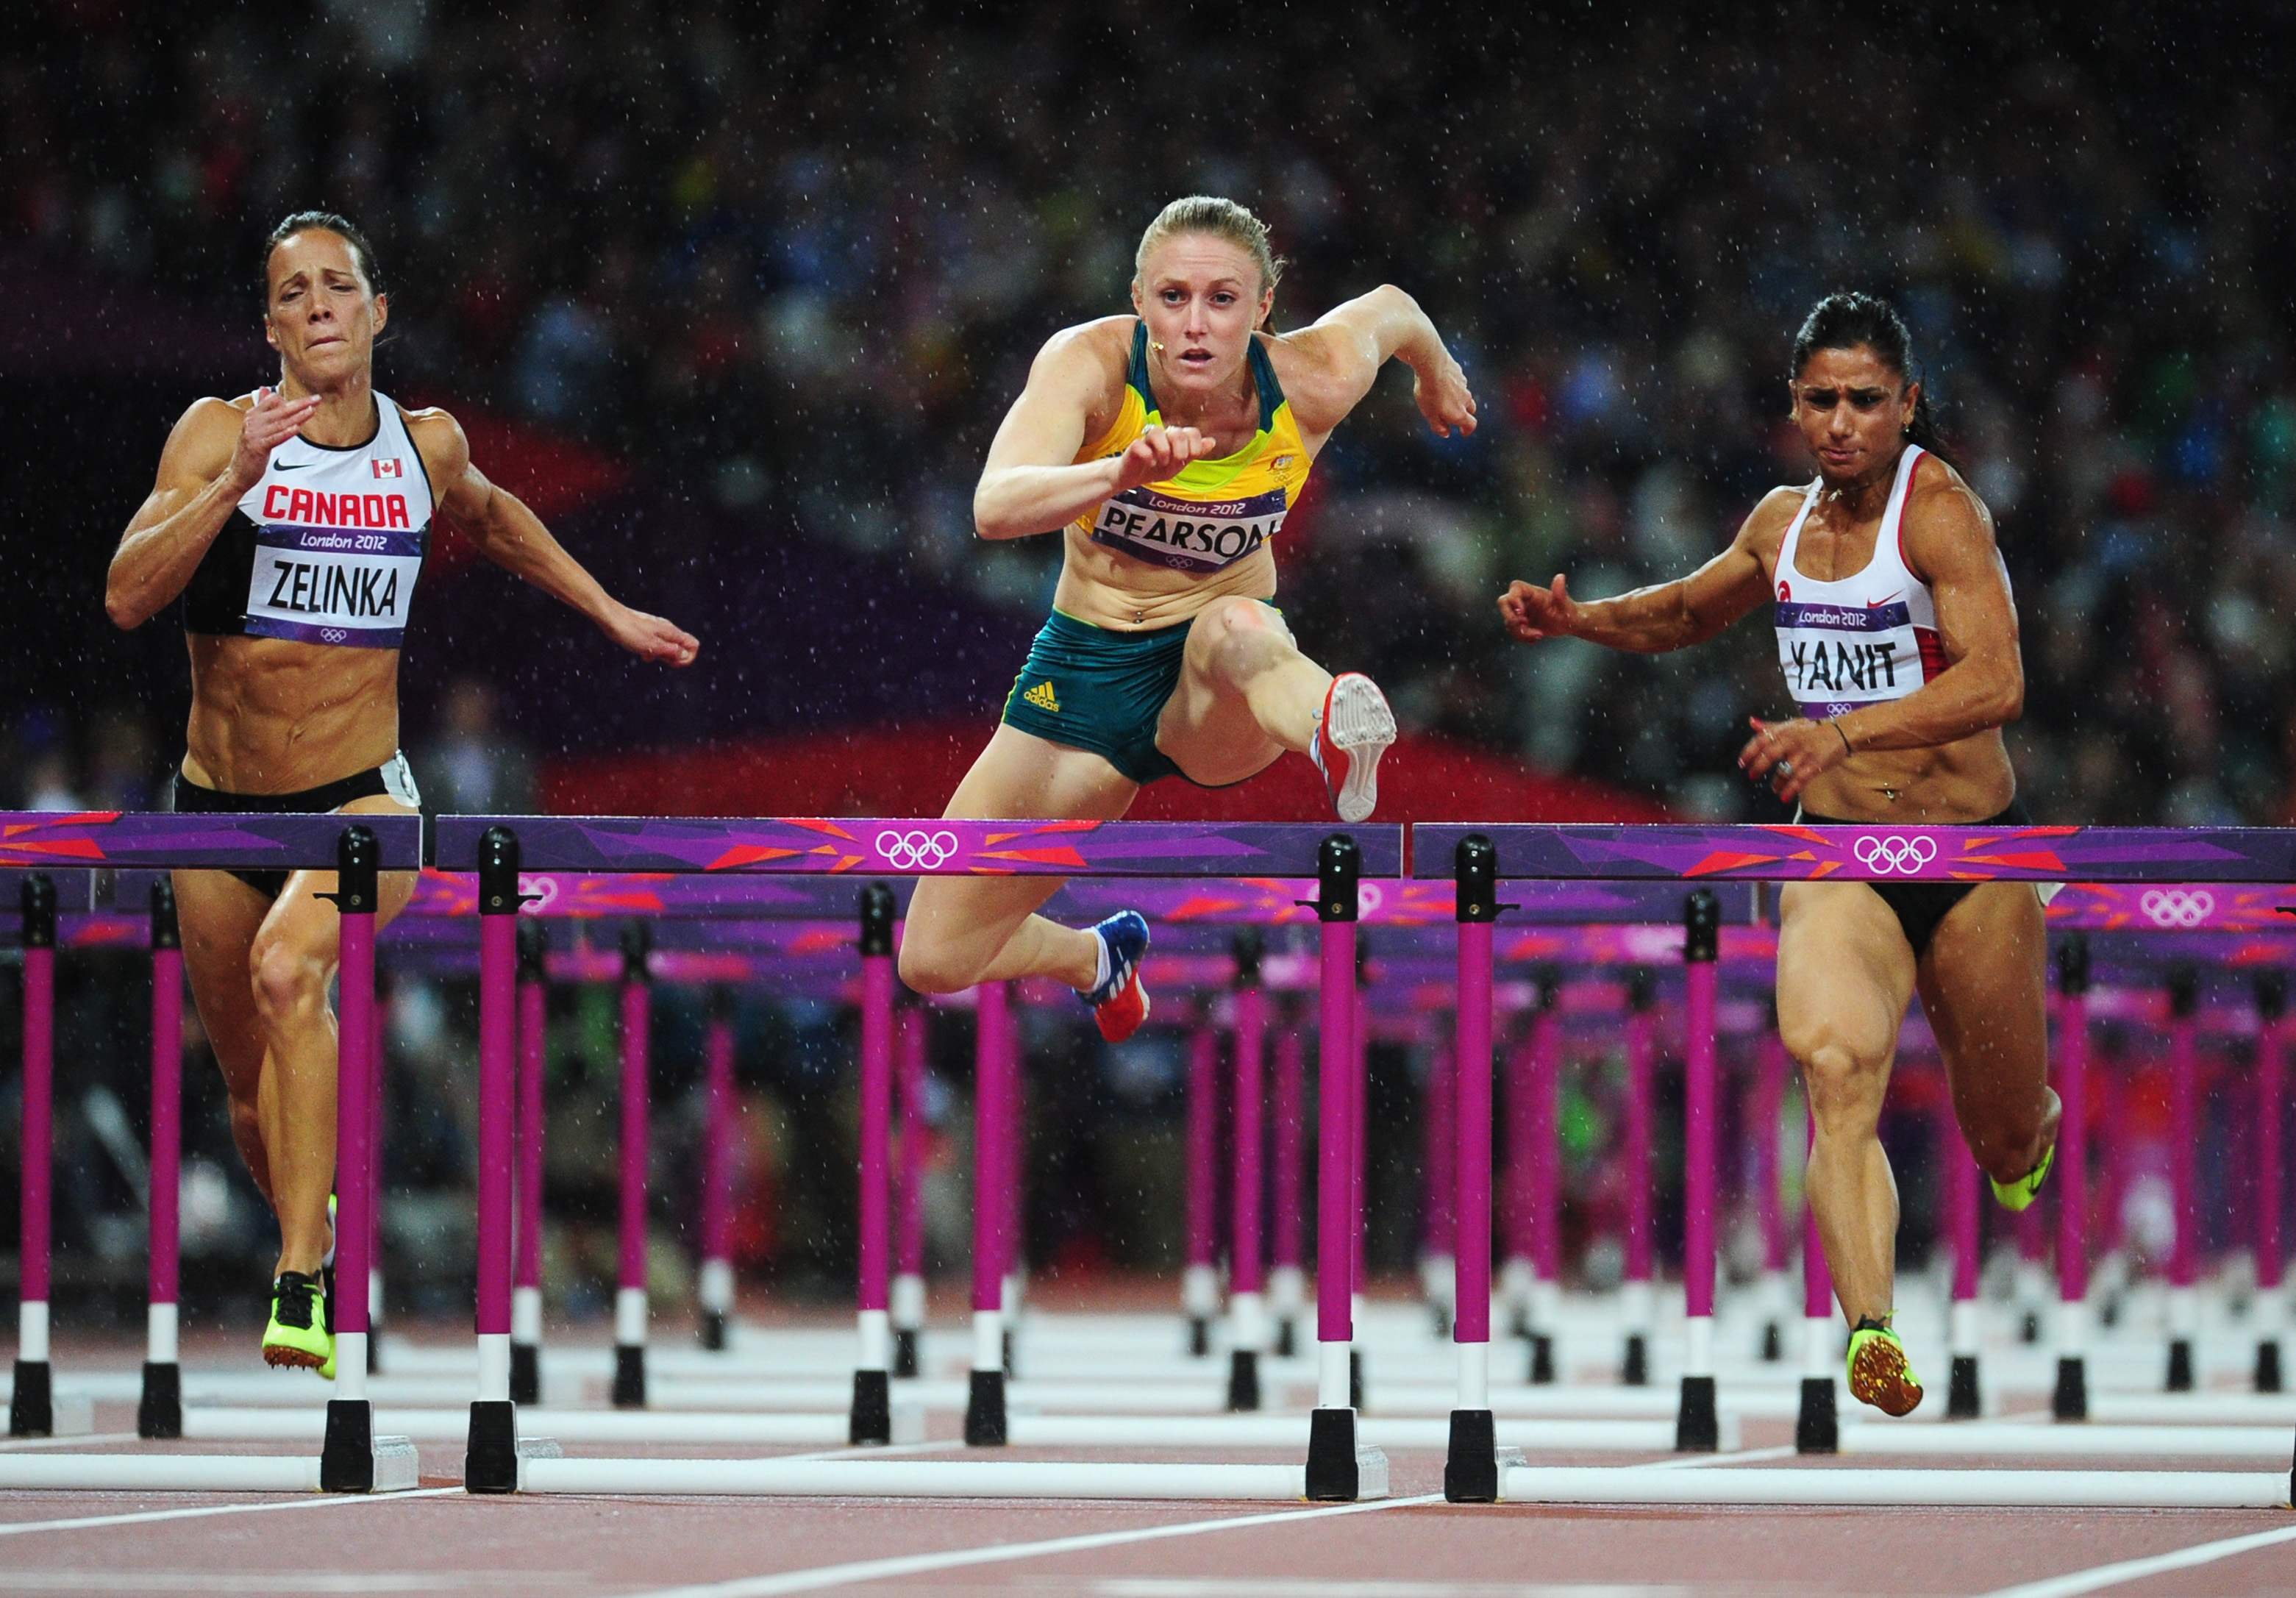 olympic hurdler pearson - HD3122×2173